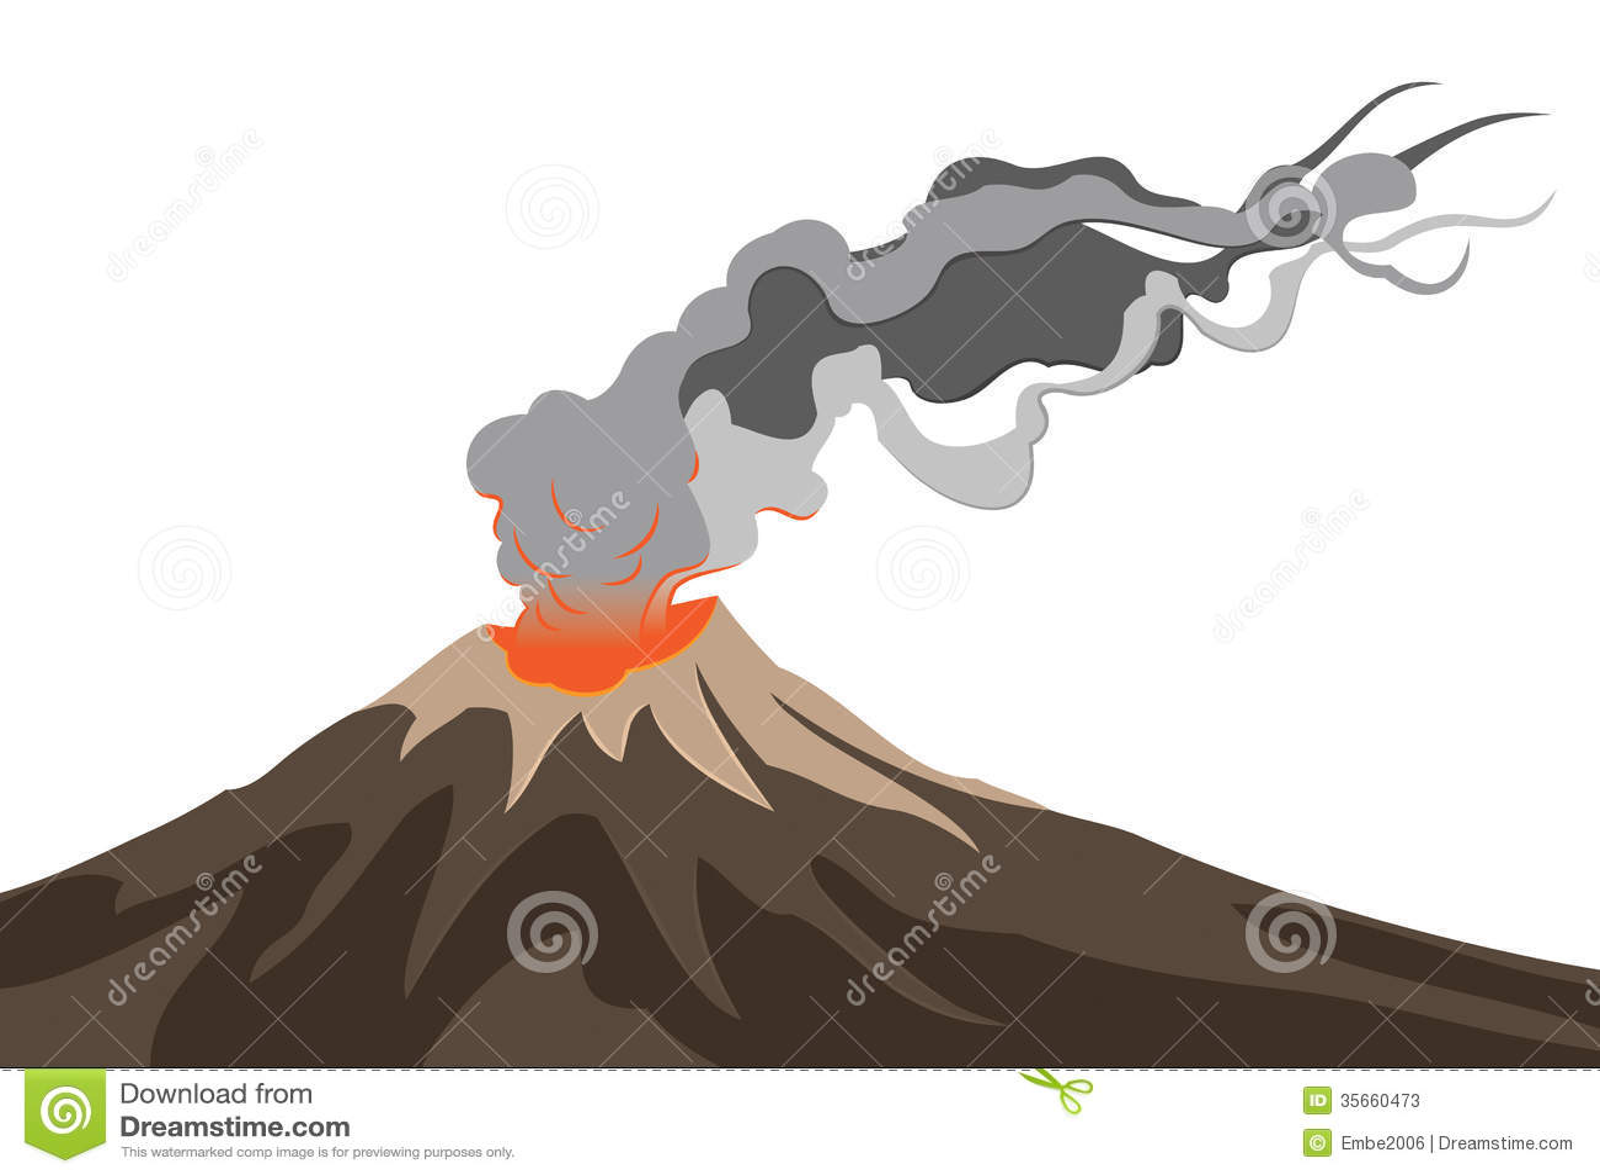 V Is For Volcano Clipart Volcano Clipart Volcano